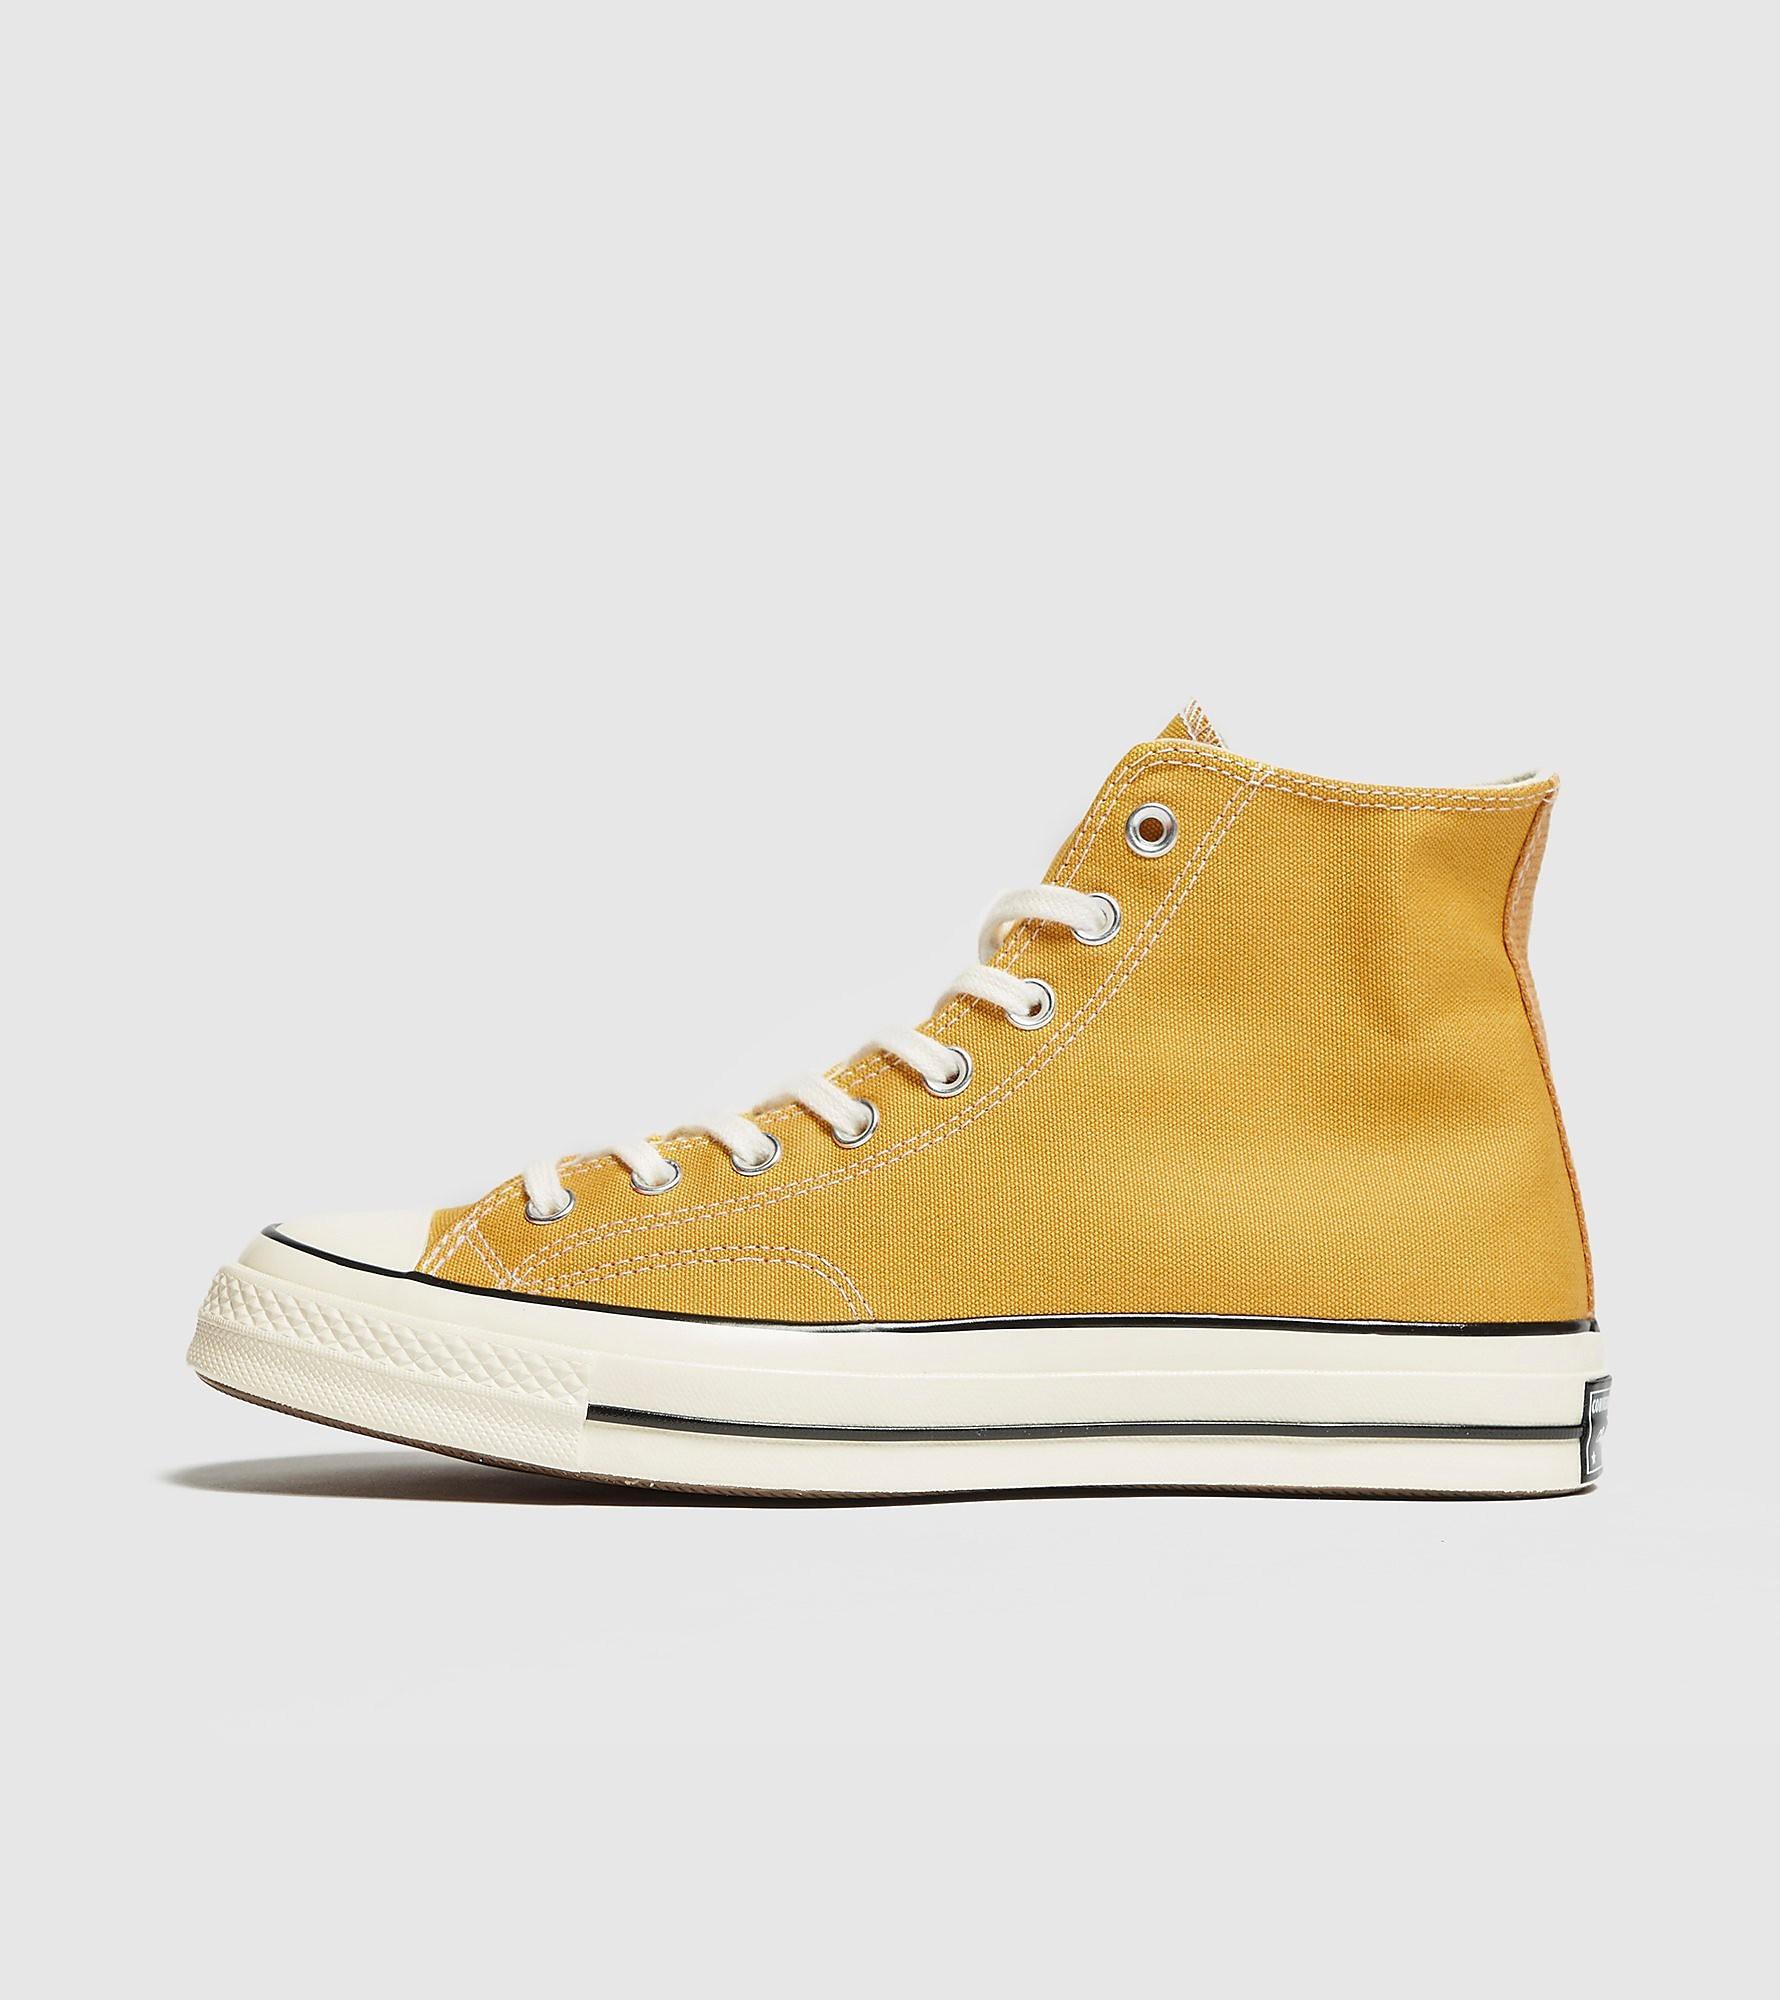 Converse Chuck Taylor All Star 70 High, Yellow